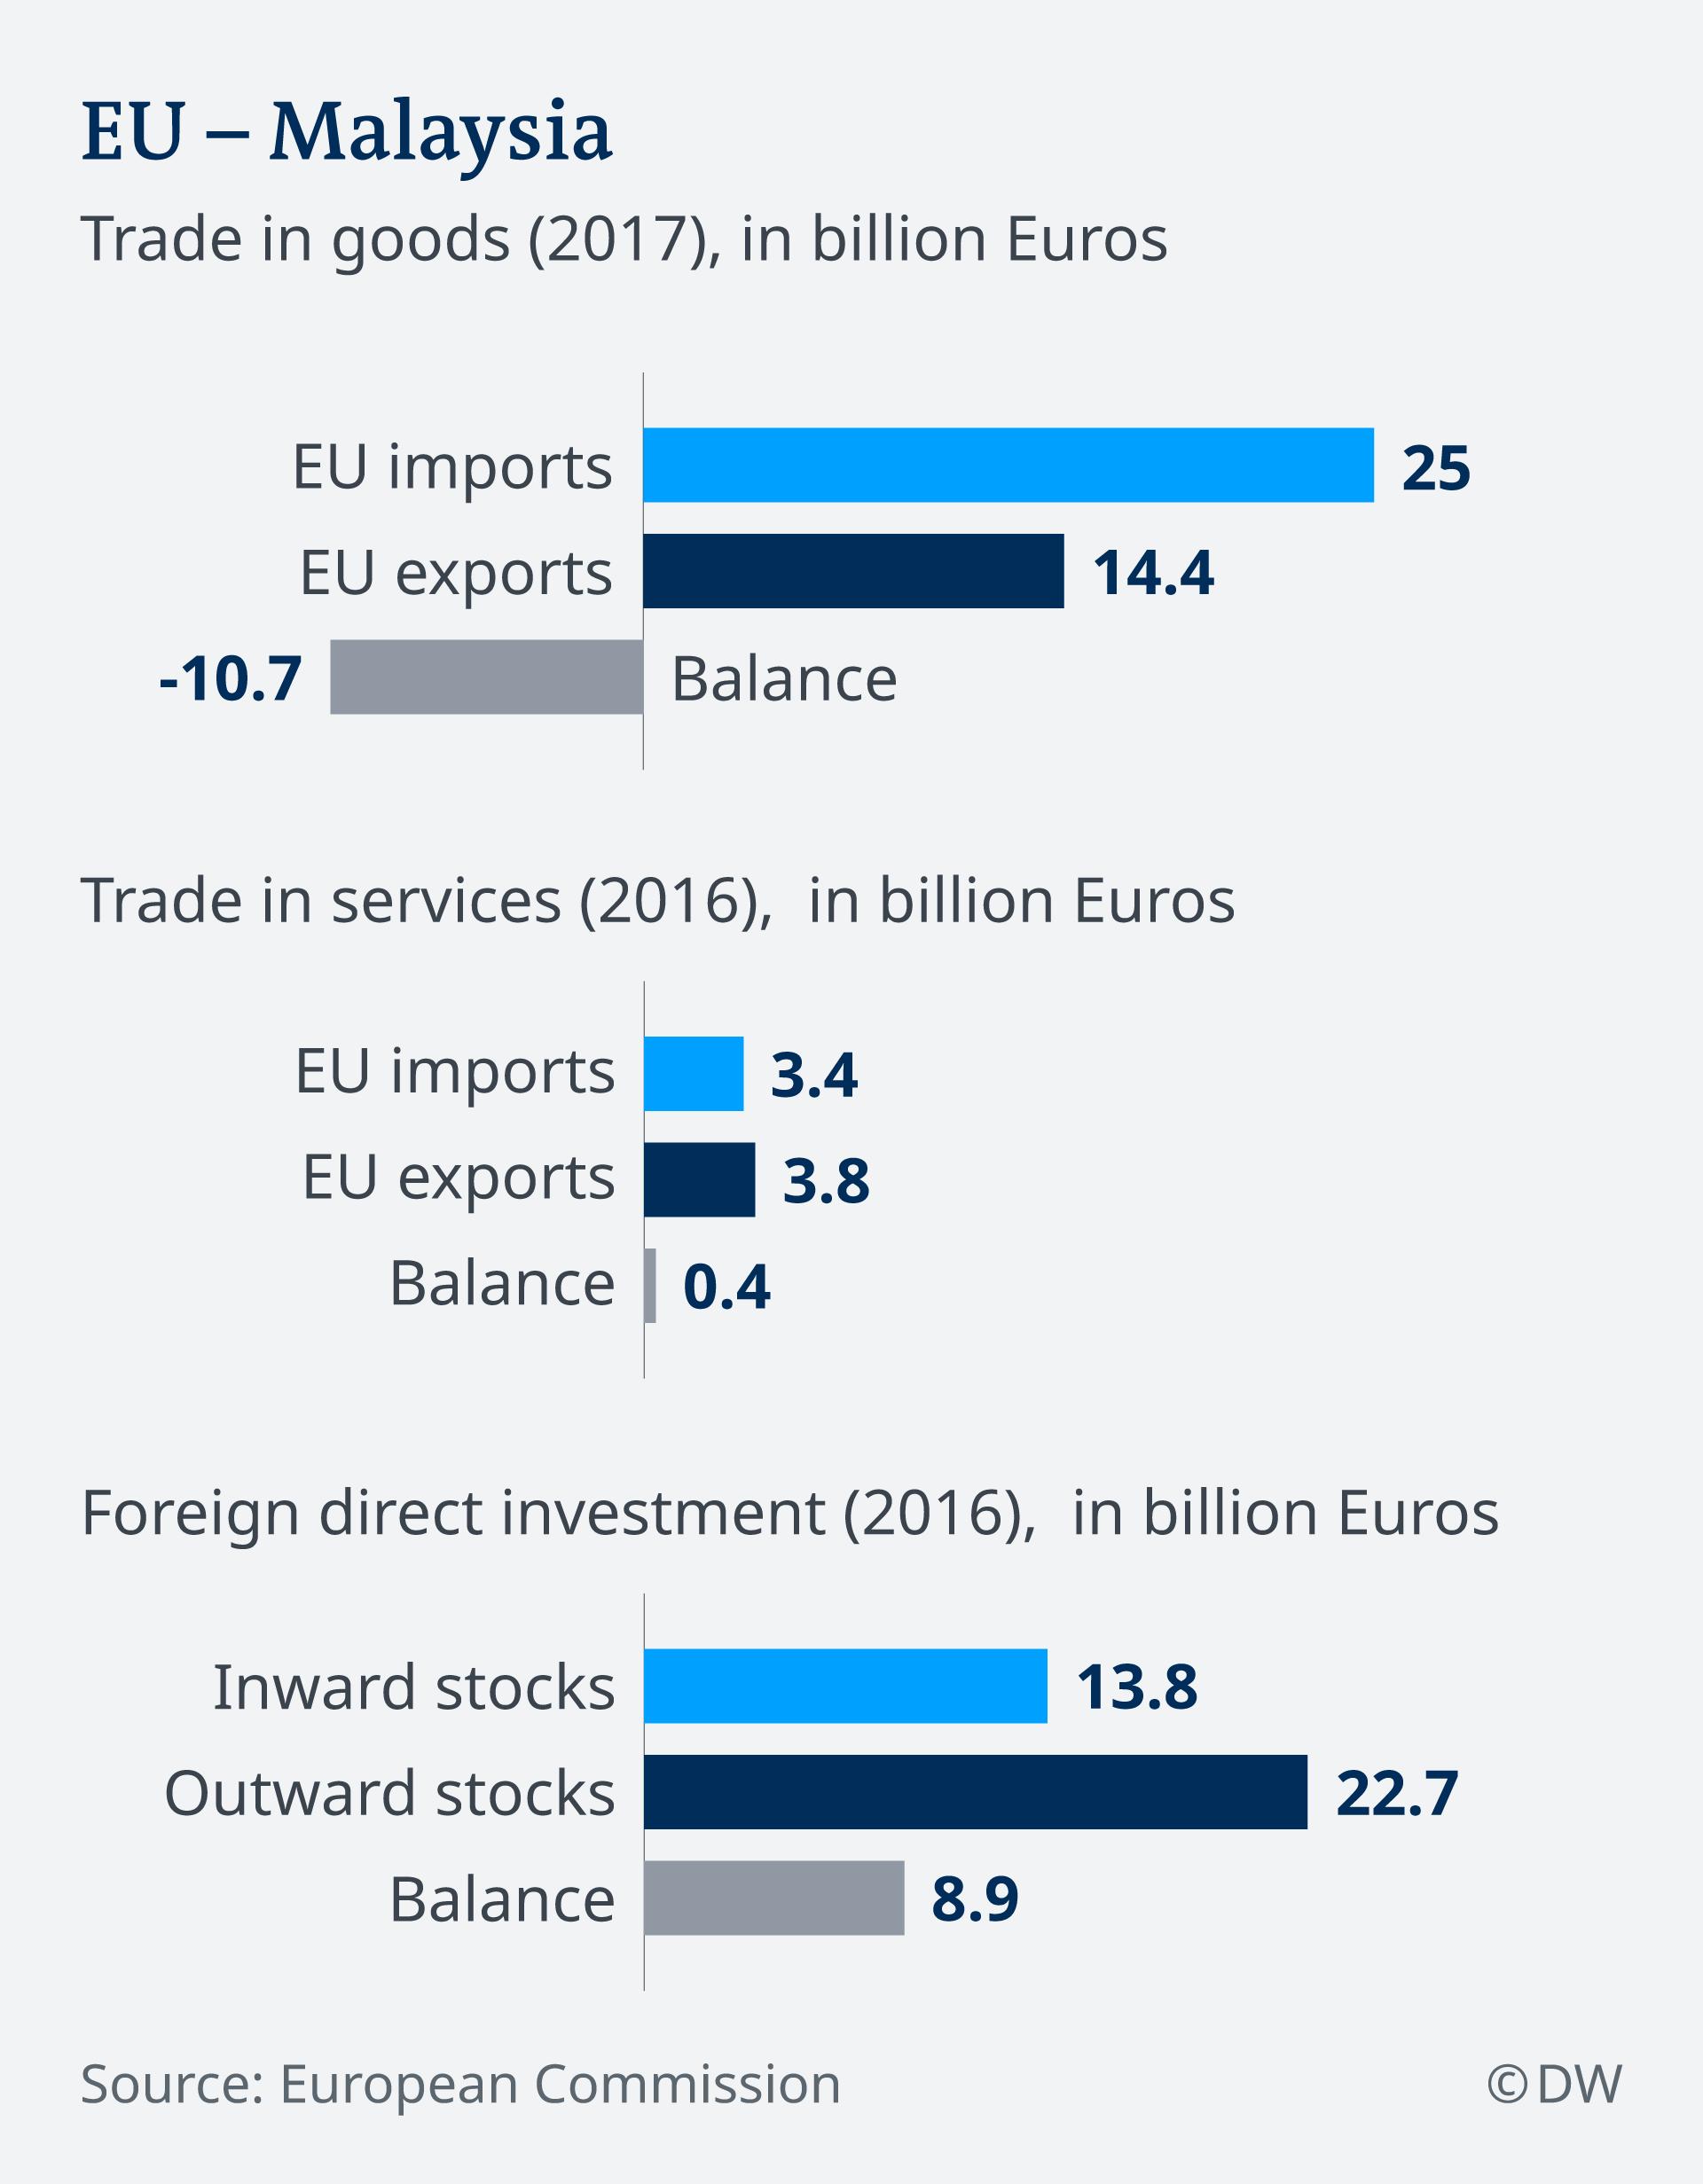 An infographic showing EU-Malaysia trade relations